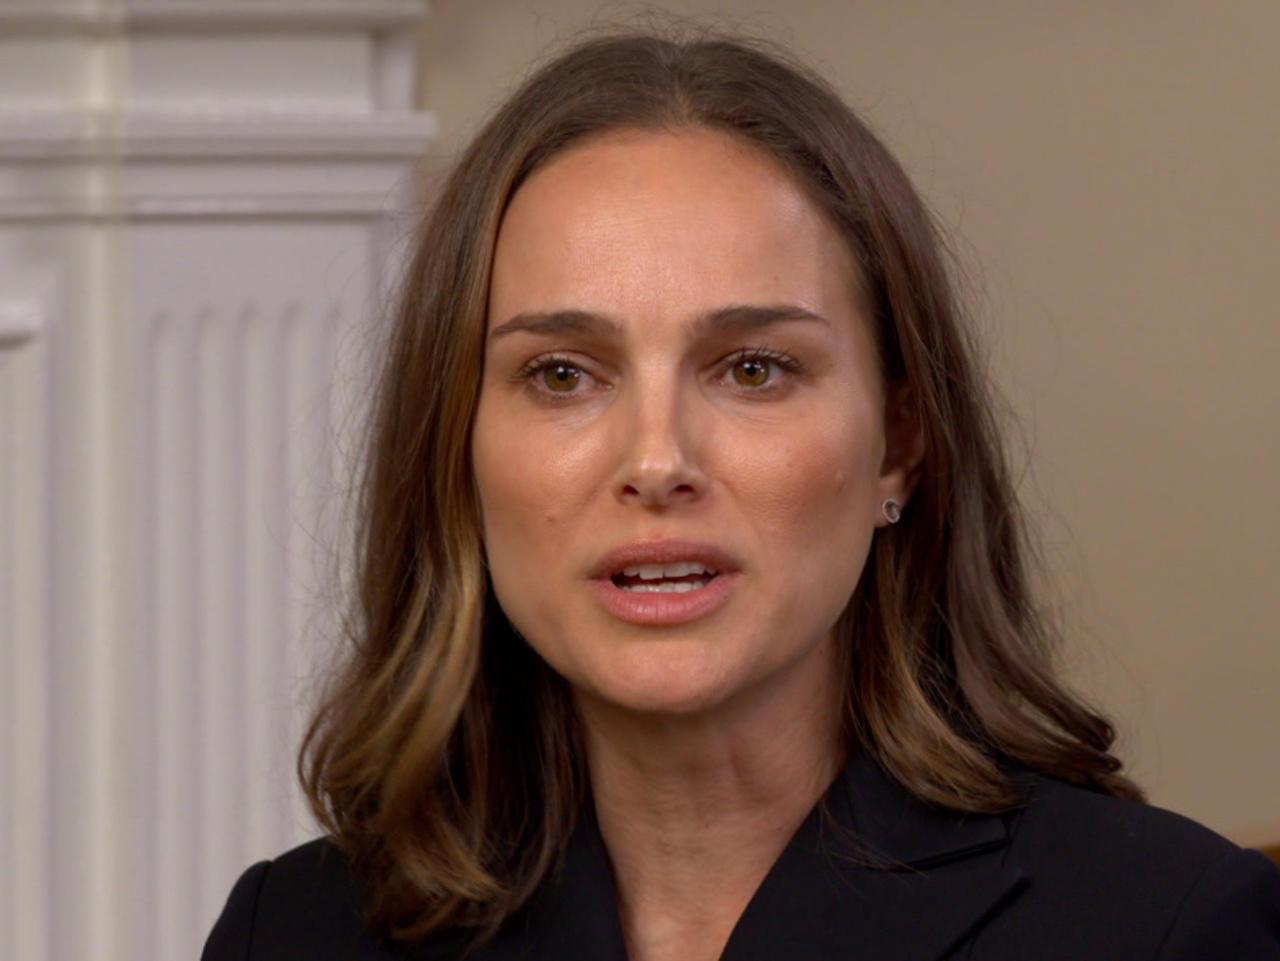 Natalie Portman snubs Israel Genesis Prize ceremony amid ...